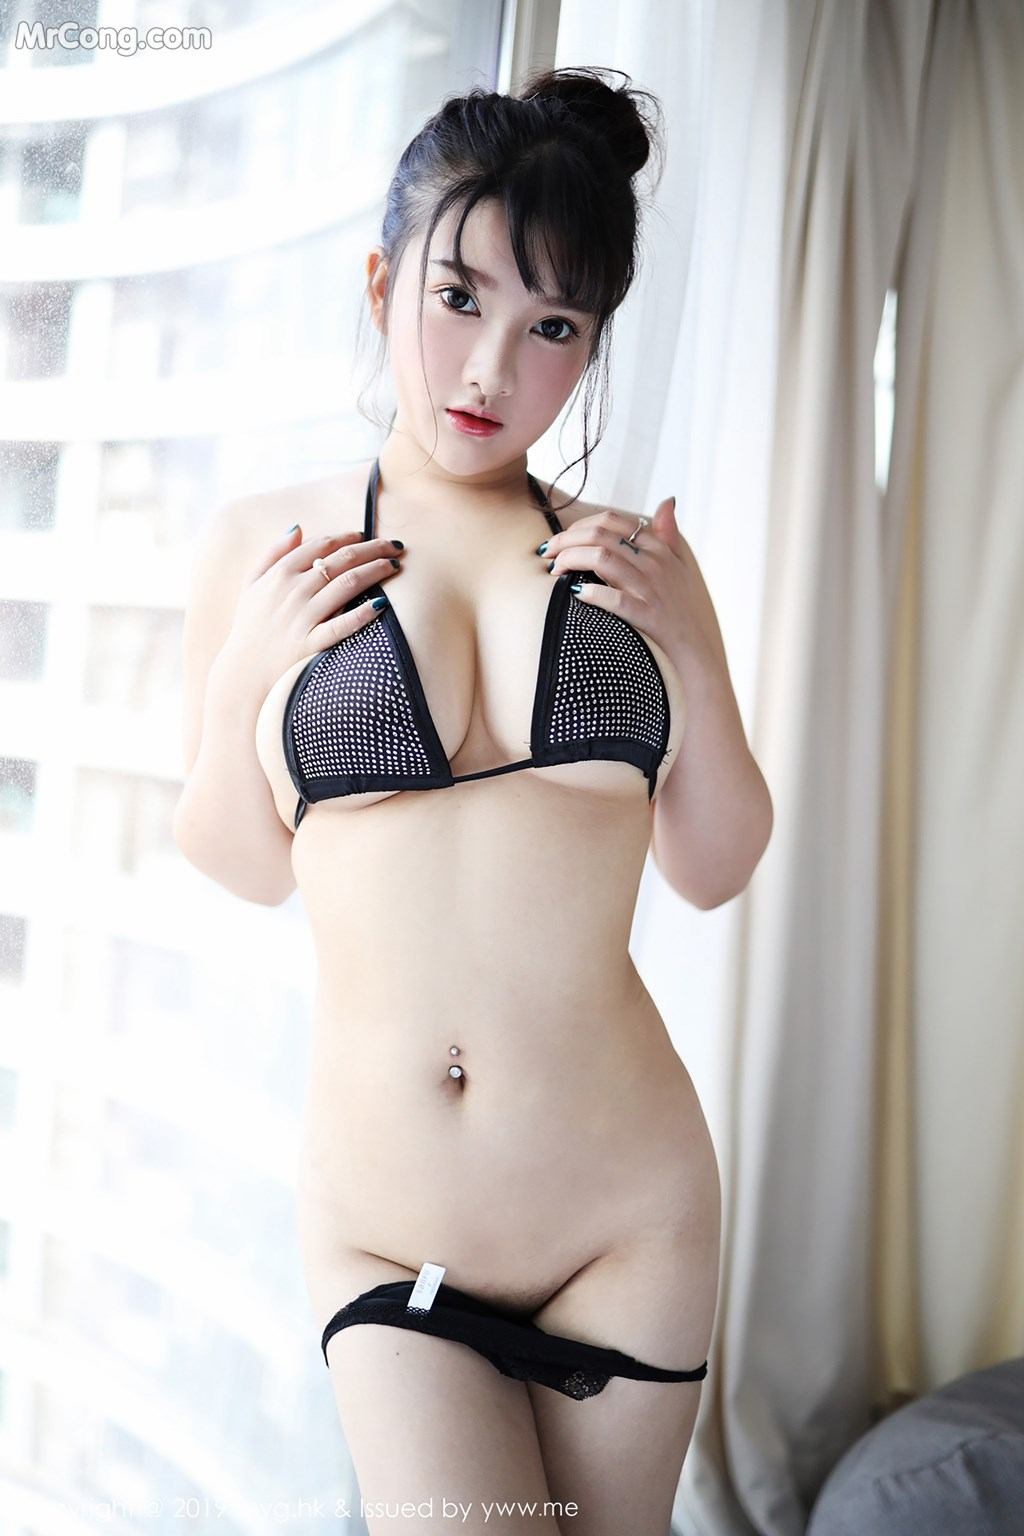 Image MyGirl-Vol.342-Xiao-You-Nai-MrCong.com-033 in post MyGirl Vol.342: Người mẫu Xiao You Nai (小尤奈) (41 ảnh)